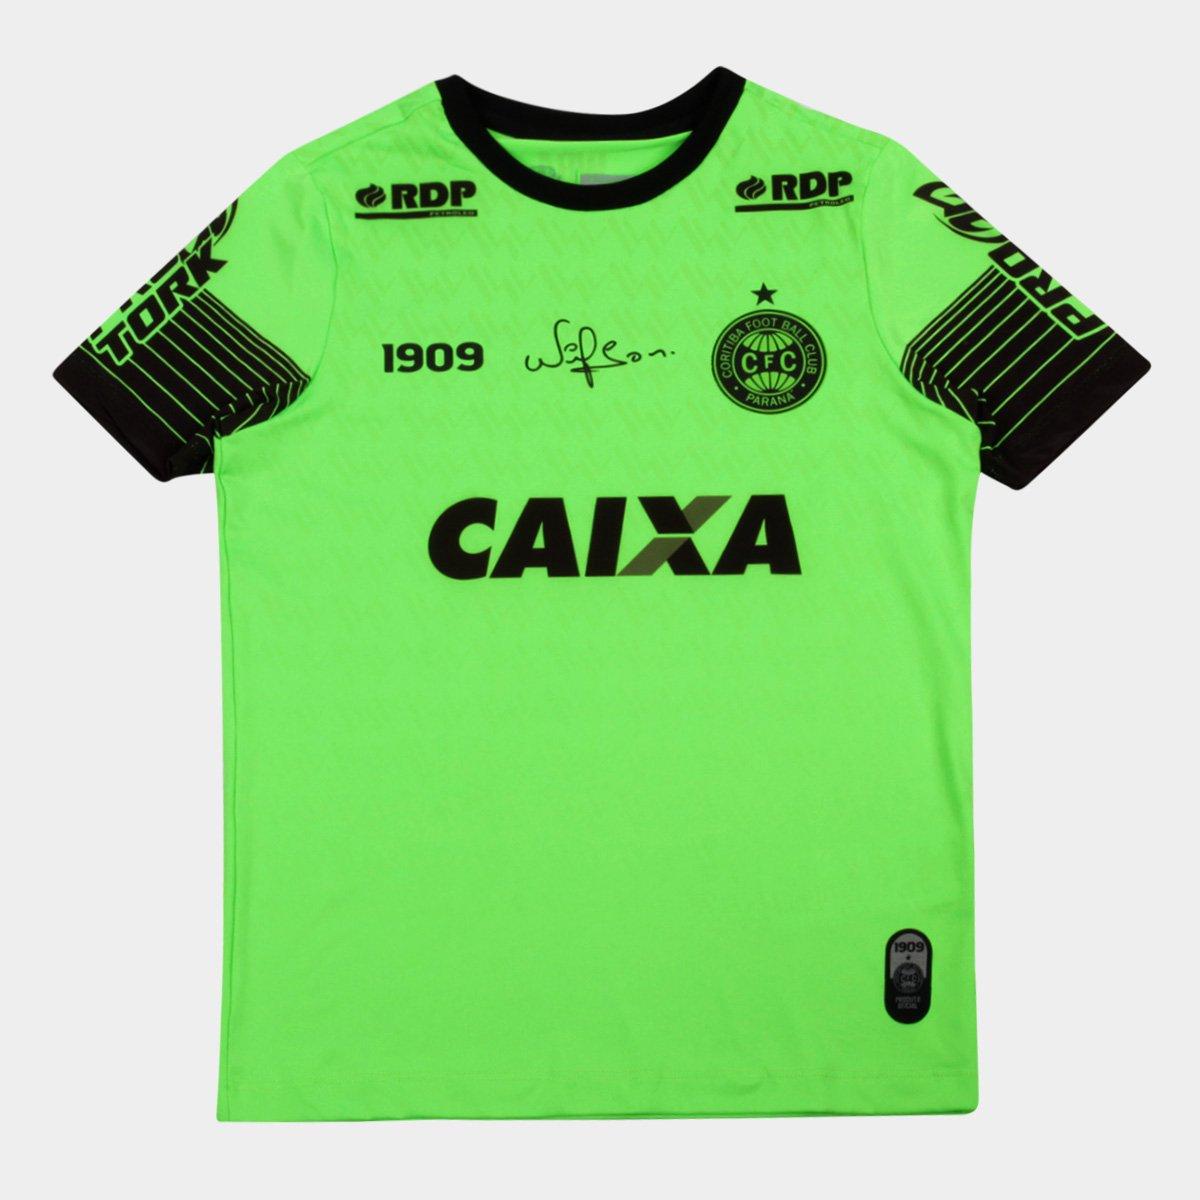 Camisa Goleiro Coritiba 2018 s n° C Patrocínio - Jogador 1909 Juvenil a687254f14c51